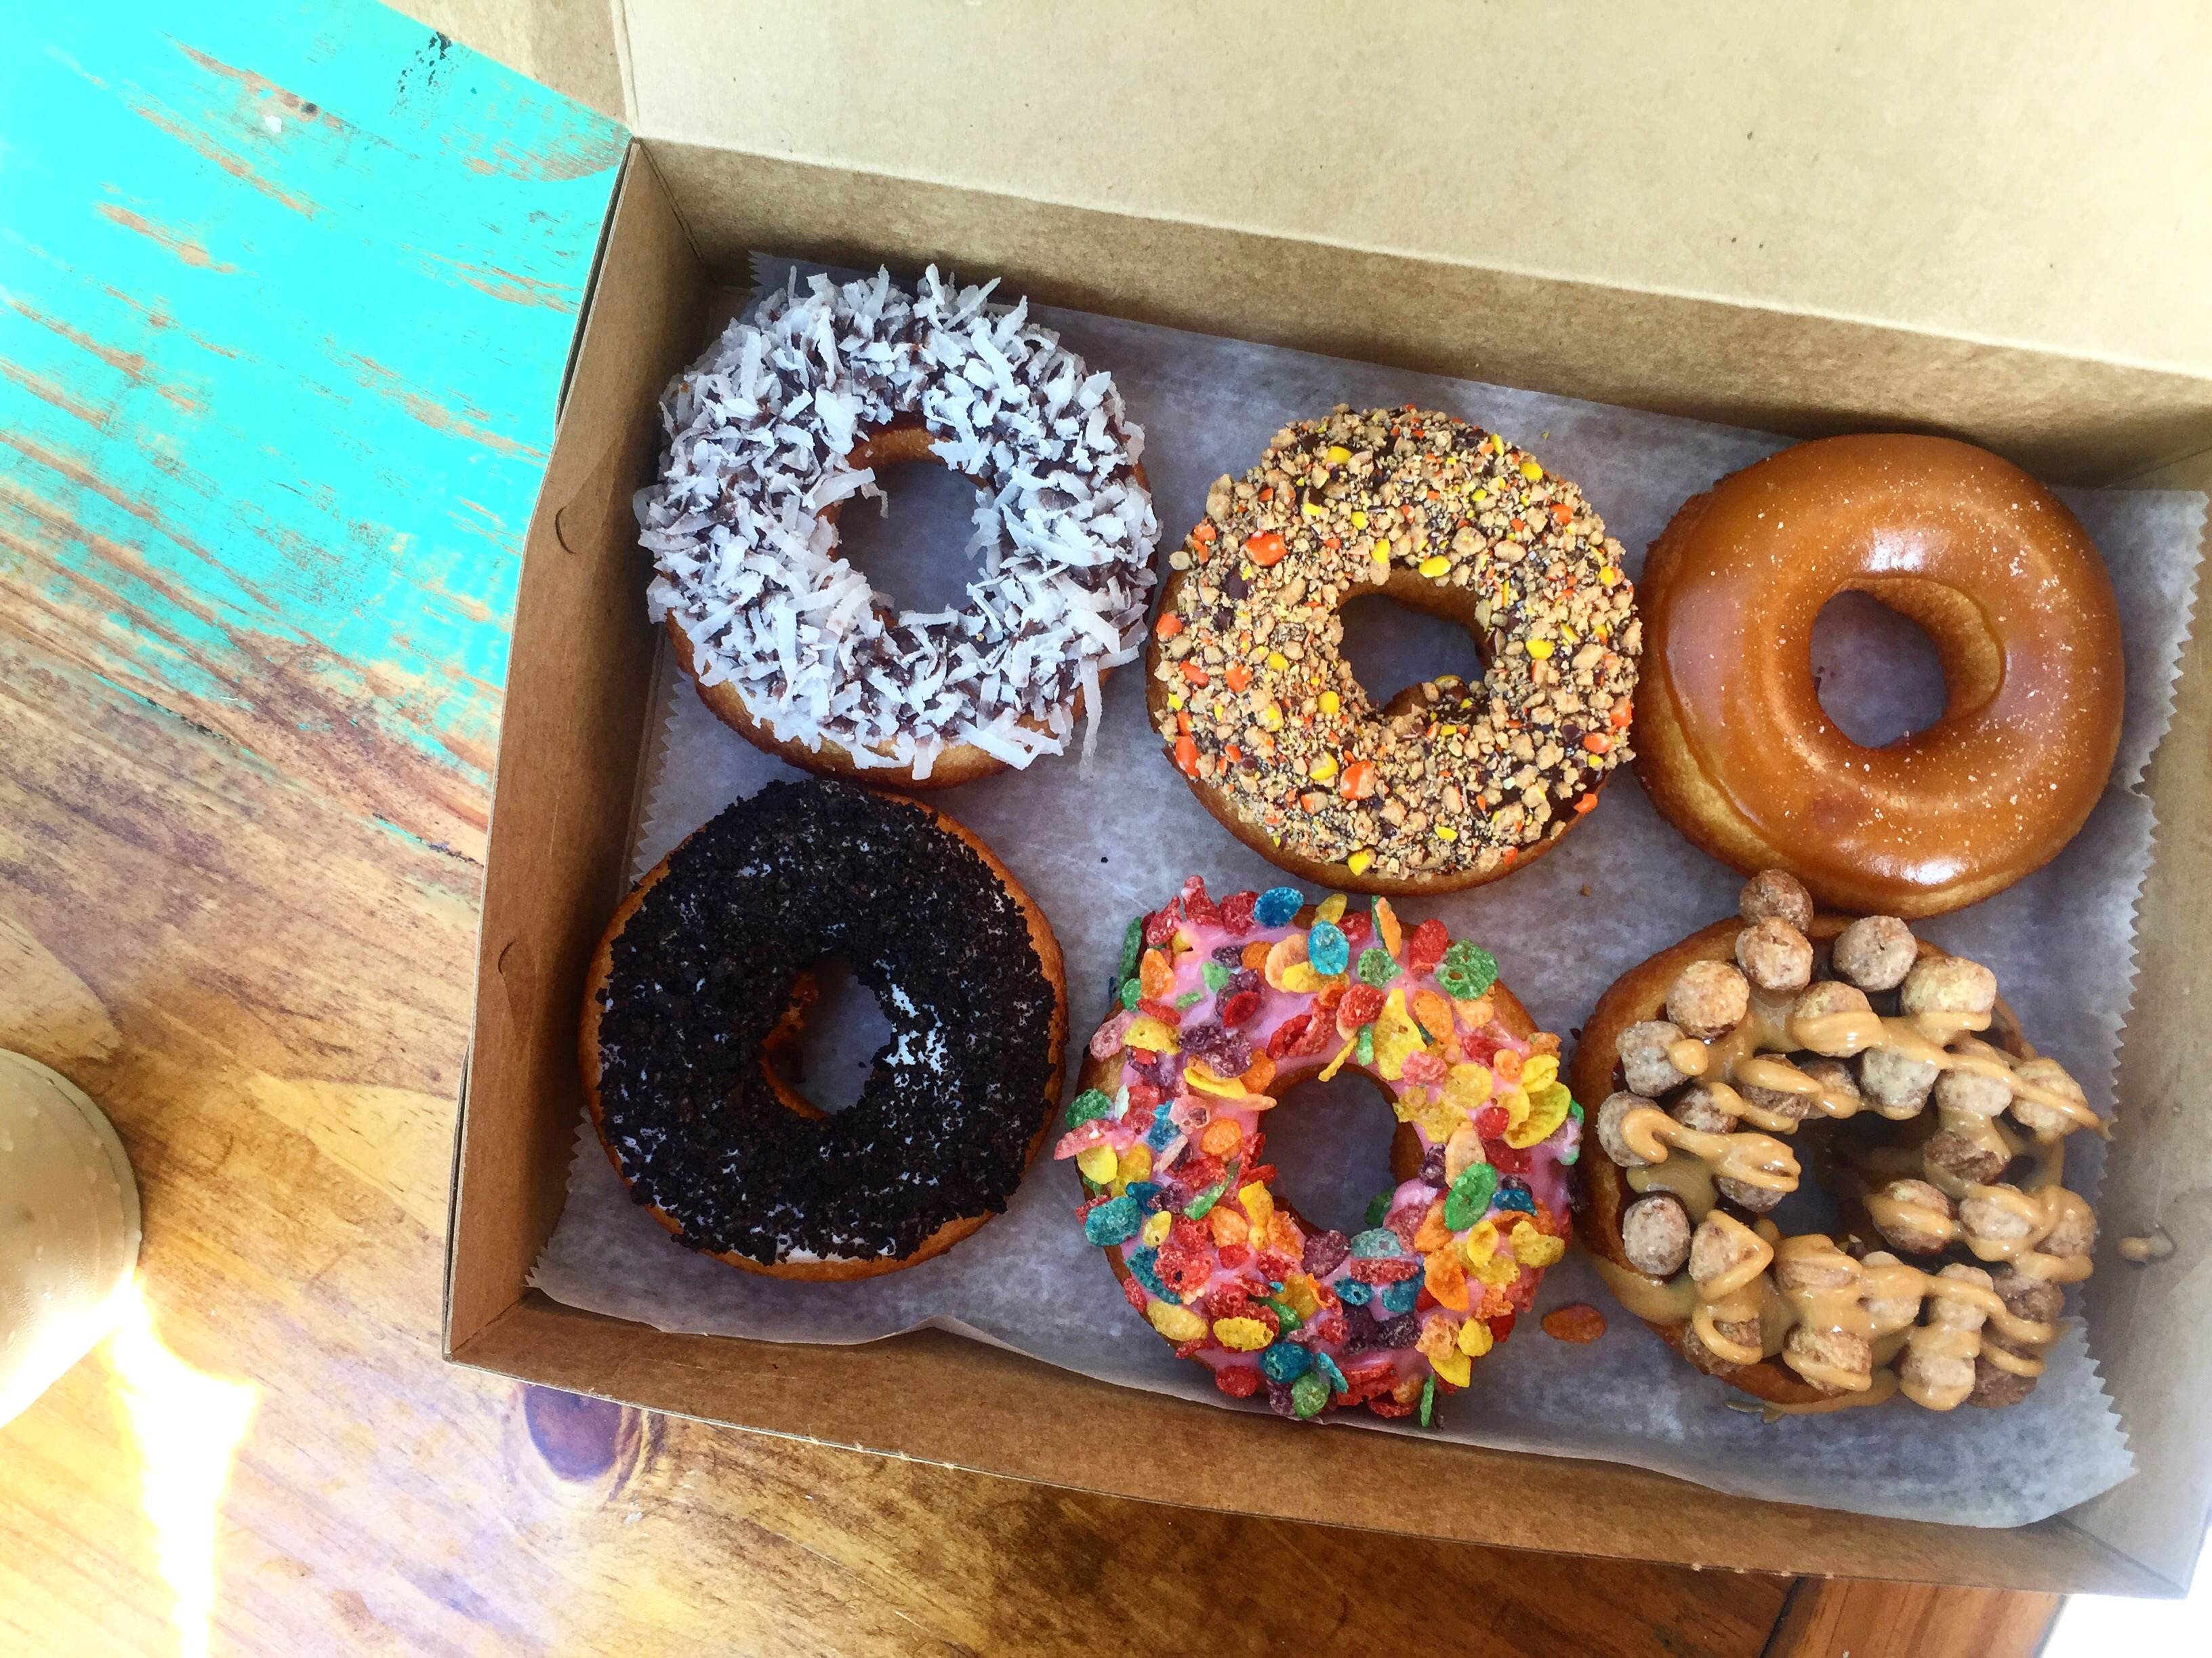 Donuts from The Donut Experiment Anna Maria Island near Sarasota, FL